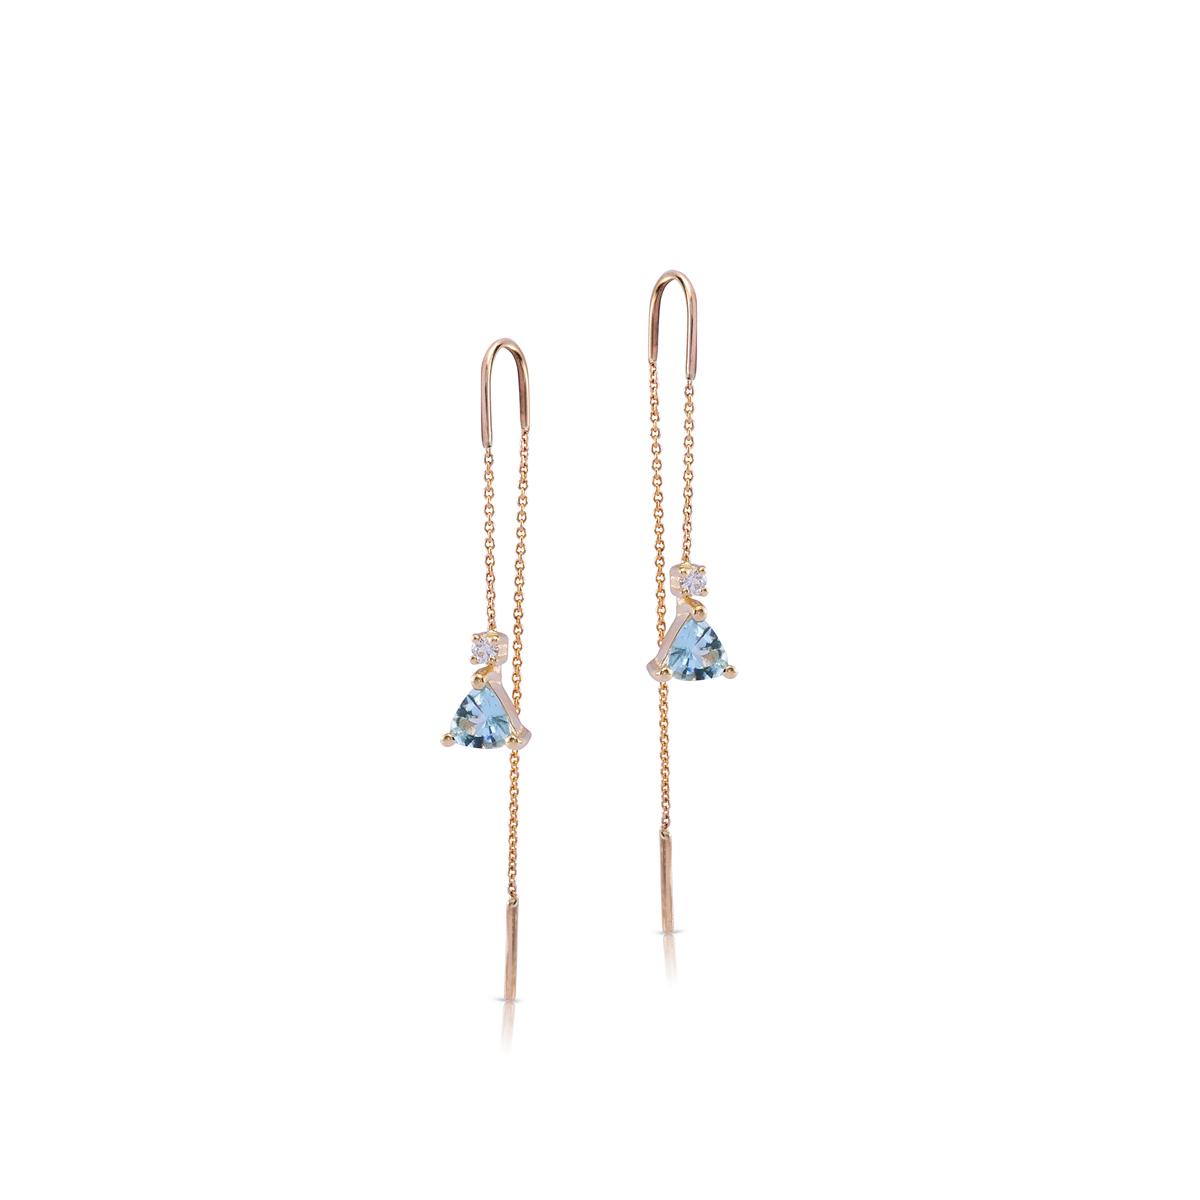 Aquamarine and diamond gold chain earrings